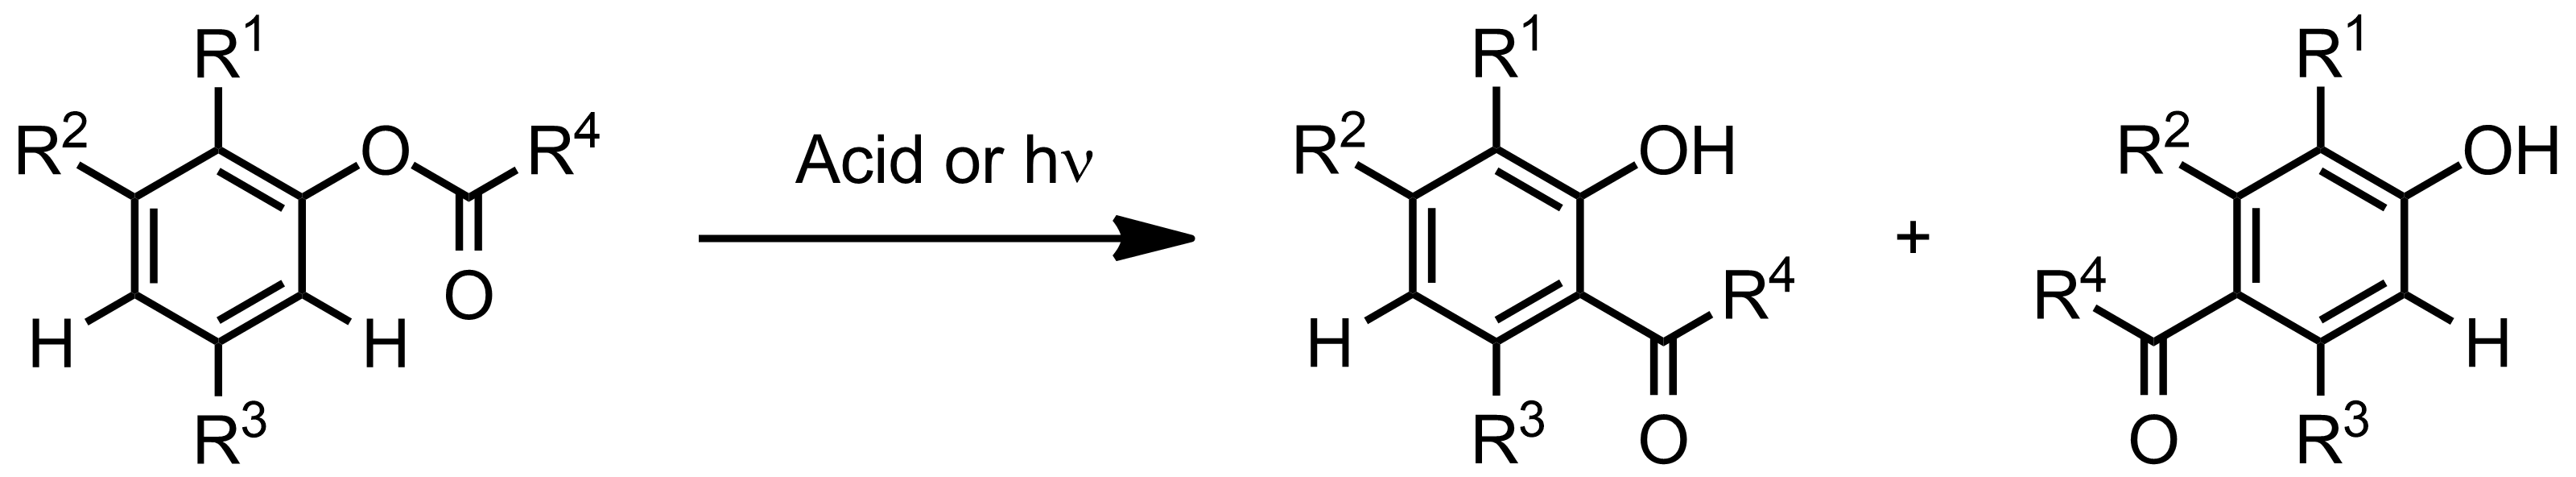 Schematic representation of the Fries Rearrangement.